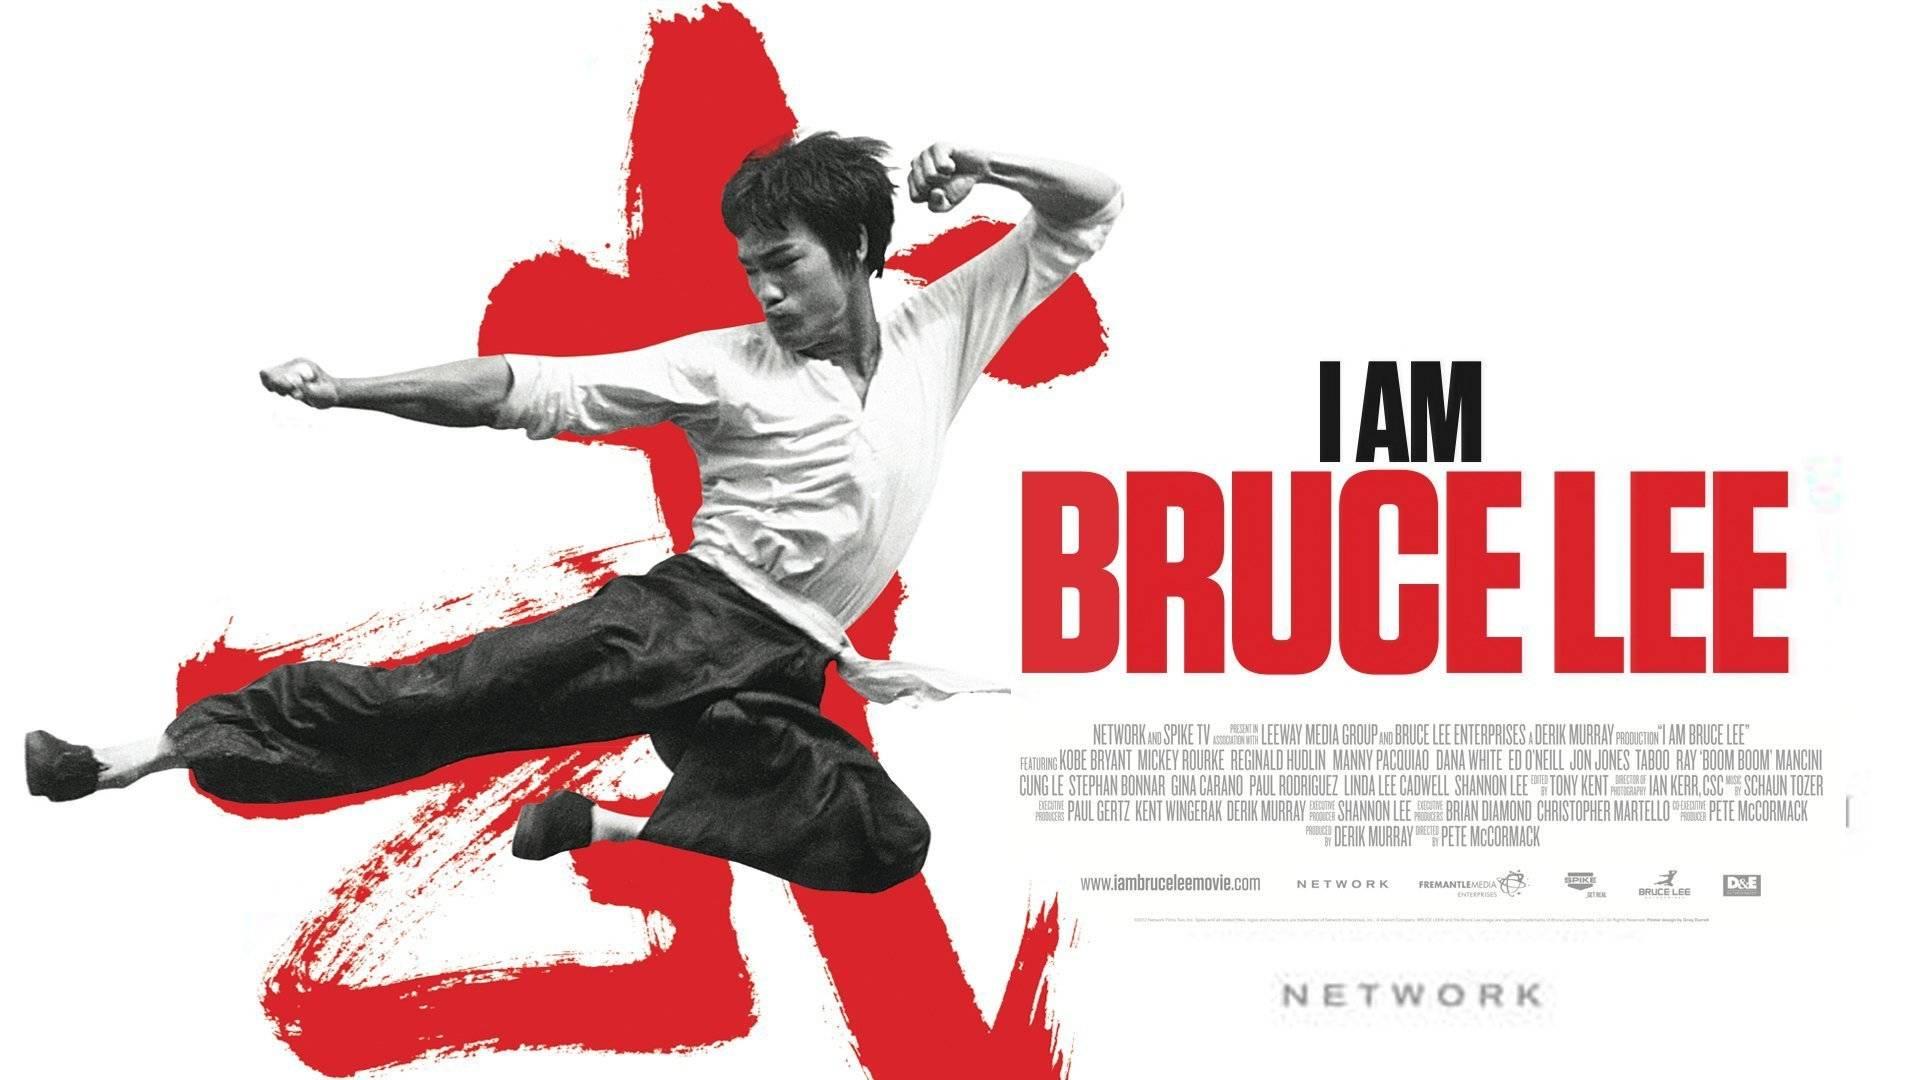 3d Dj Wallpaper Free Download Bruce Lee Wallpapers Hd Pixelstalk Net